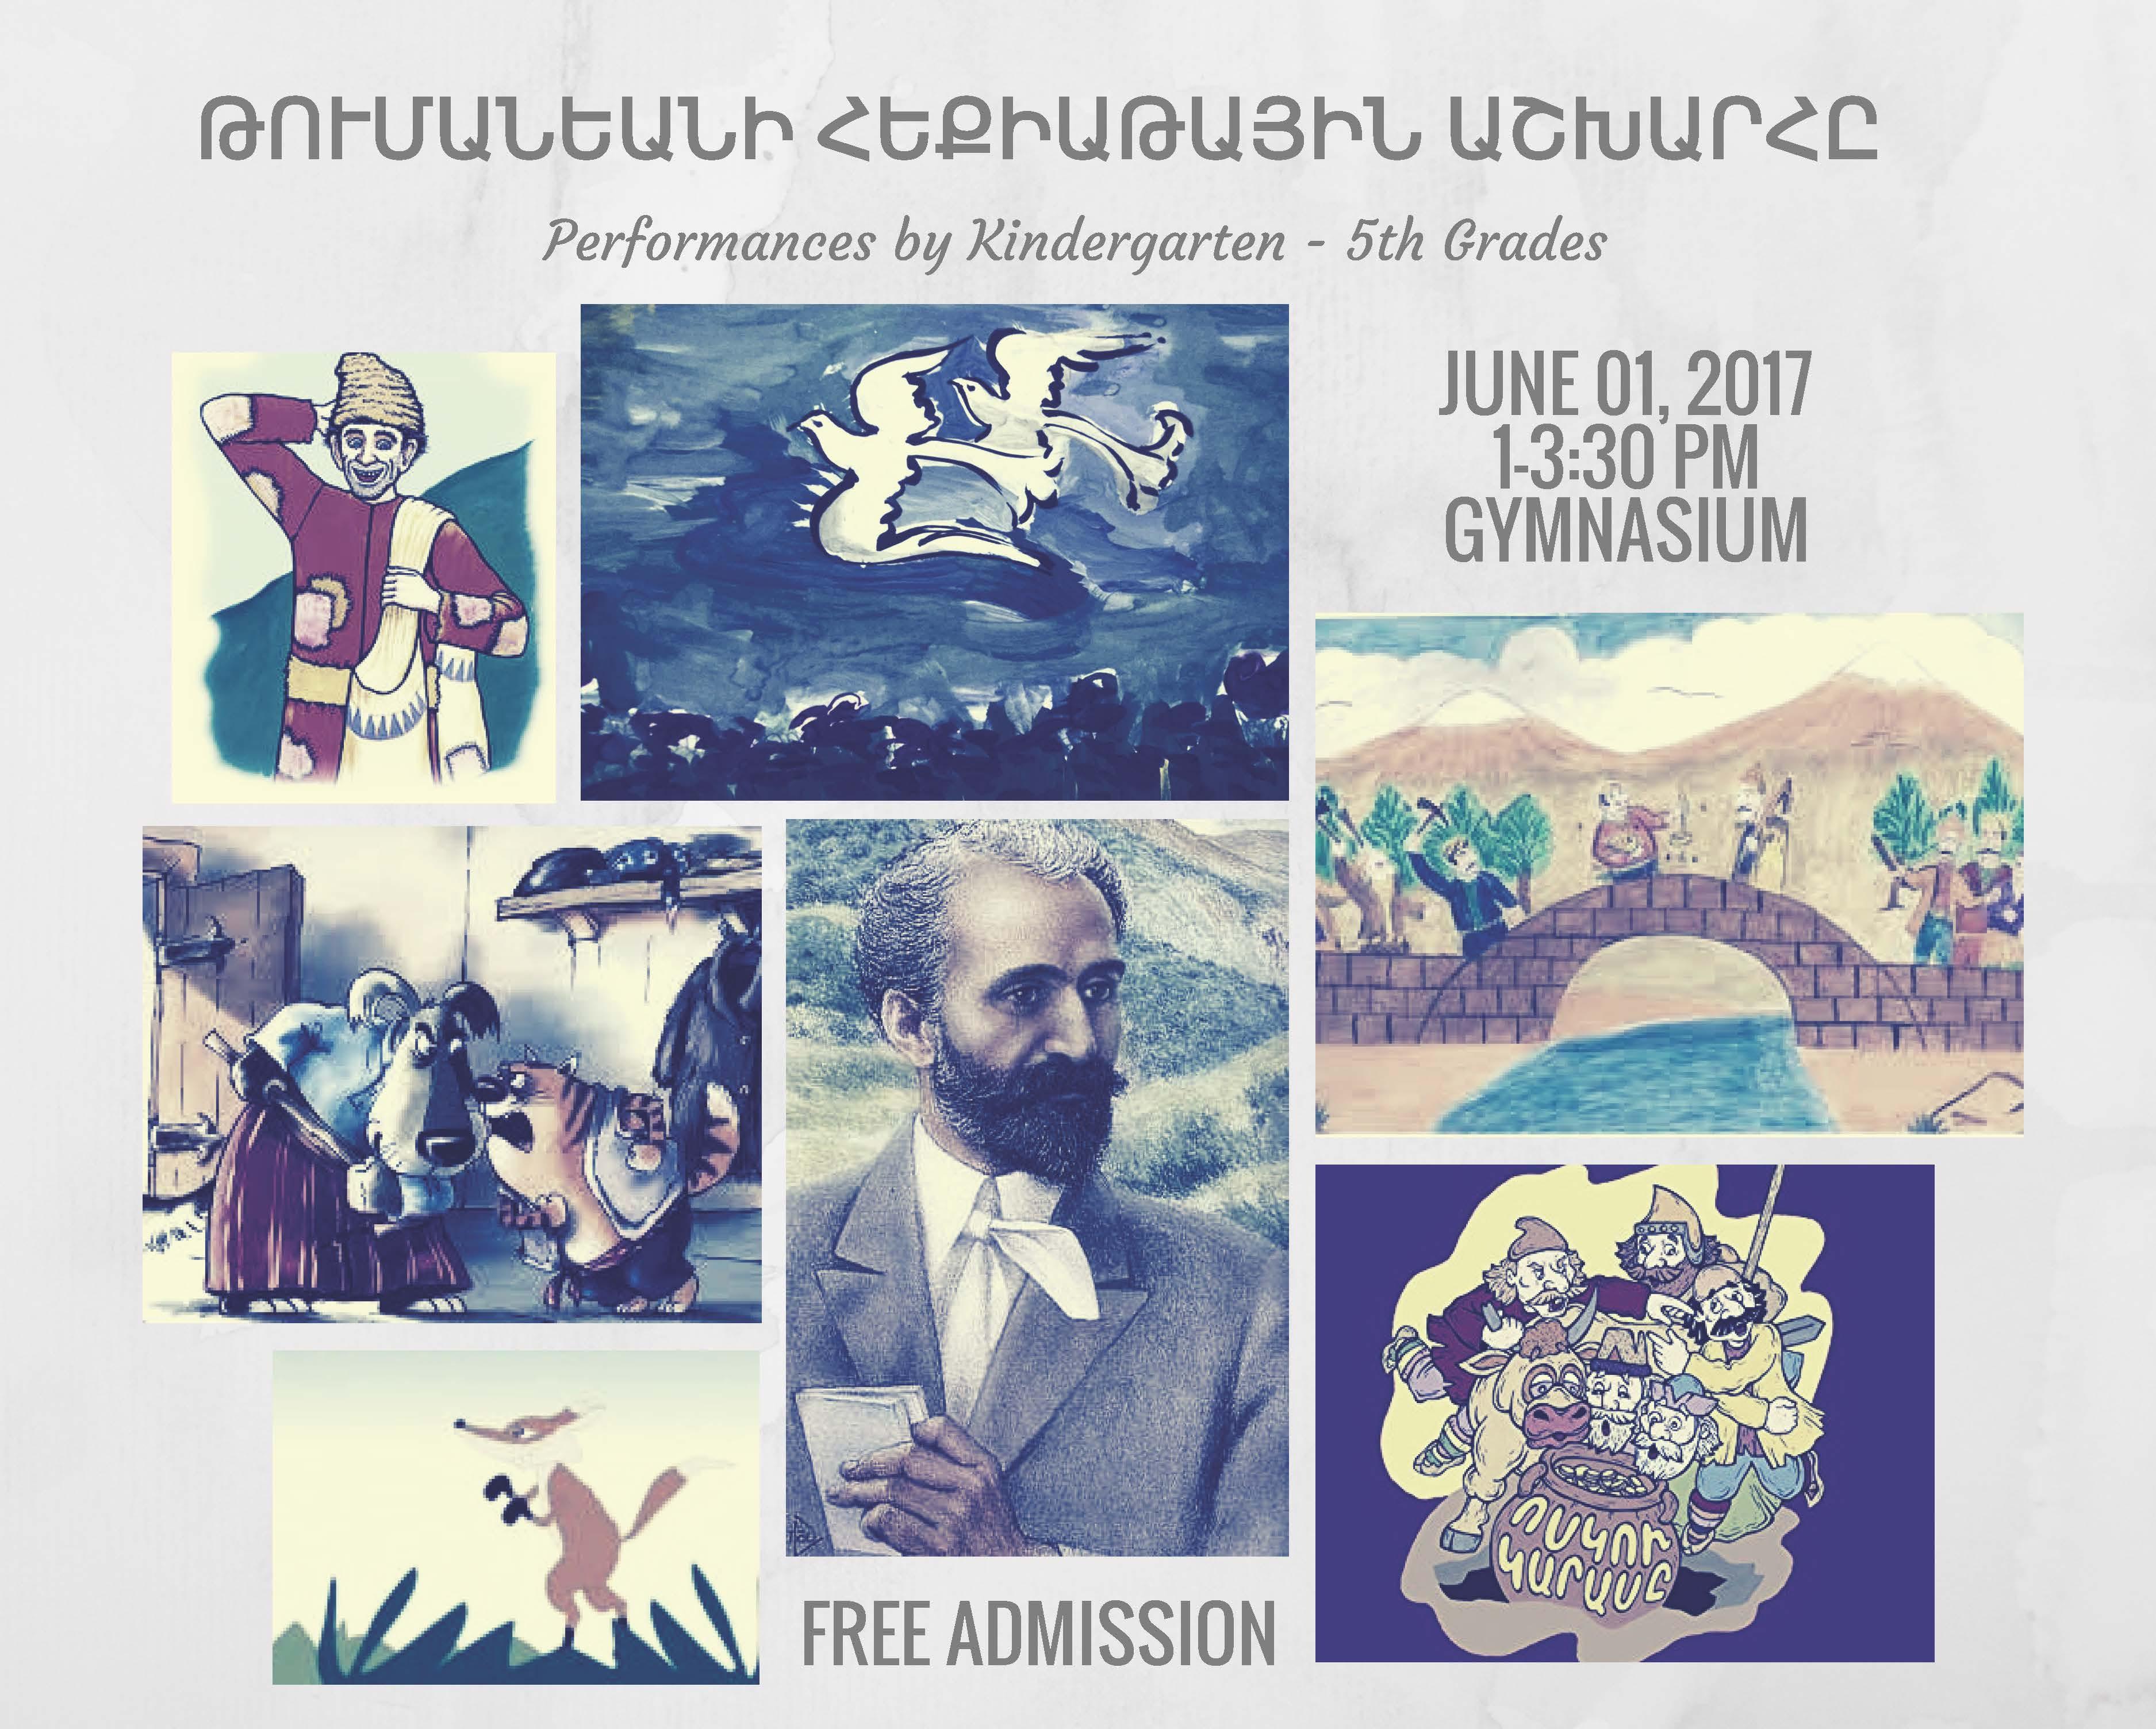 Hovhannes_Tumanyan_Save_the_Date.jpg